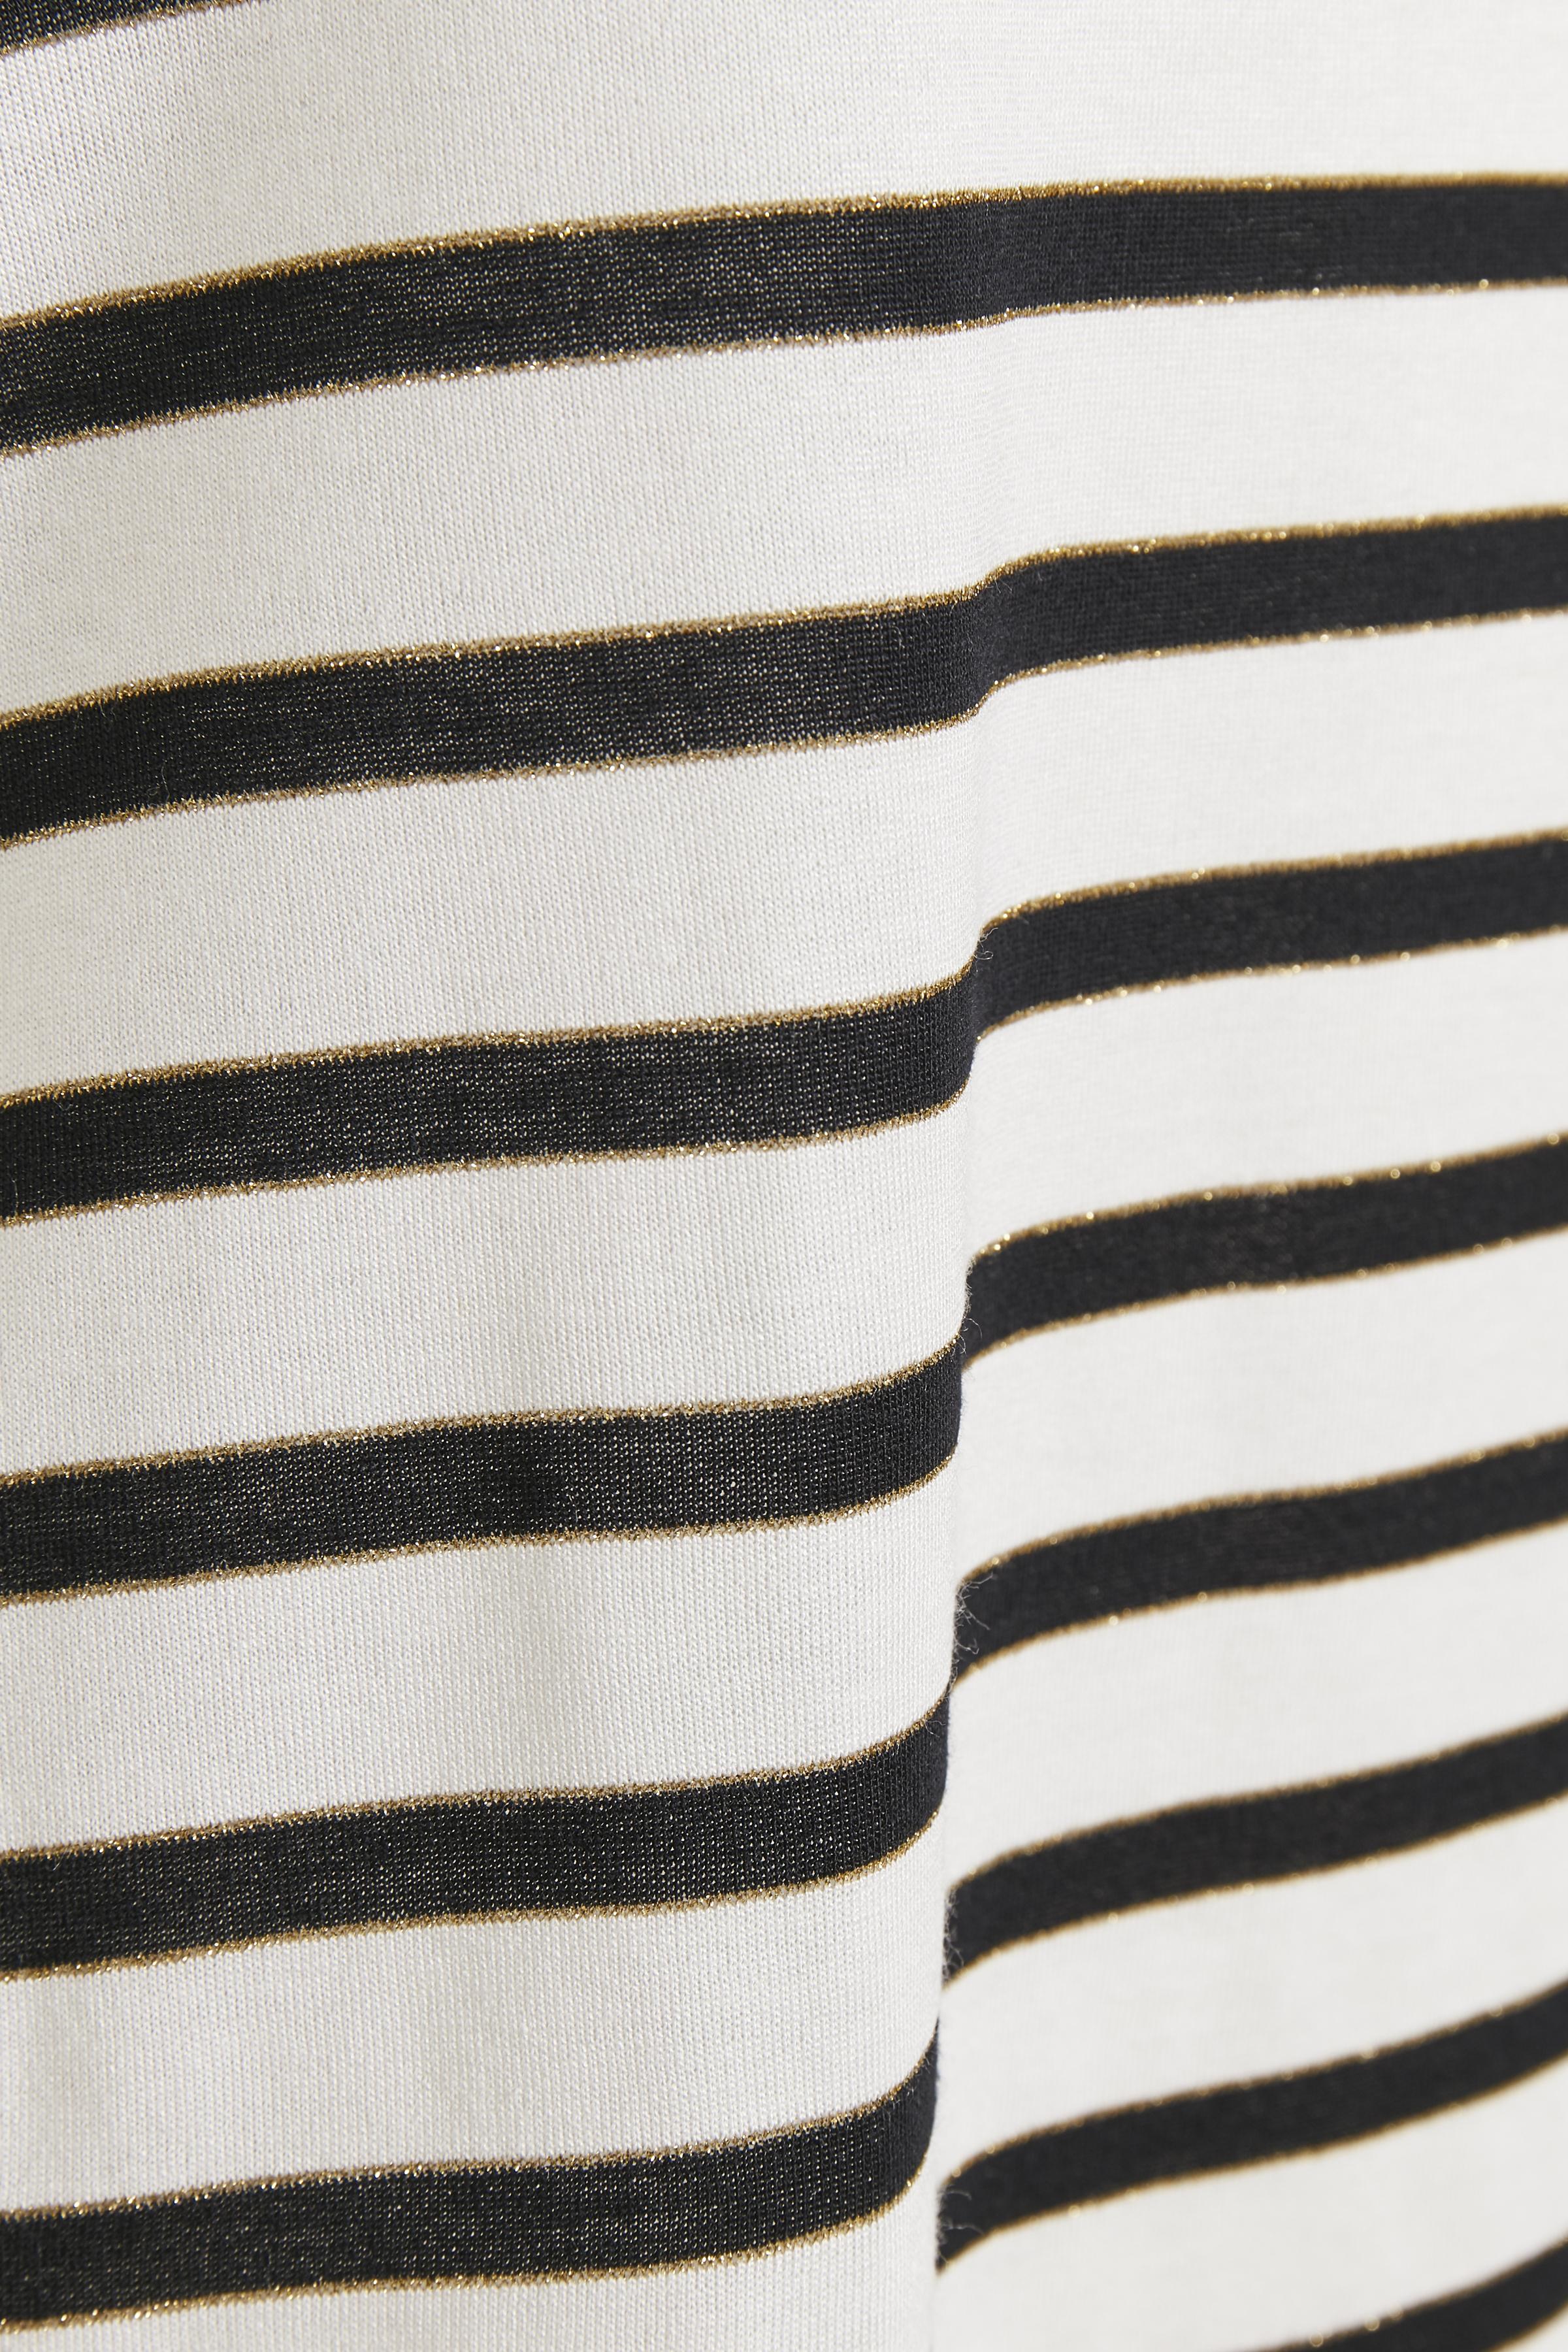 Wollweiß/marineblau Top von Bon'A Parte – Shoppen Sie Wollweiß/marineblau Top ab Gr. S-2XL hier